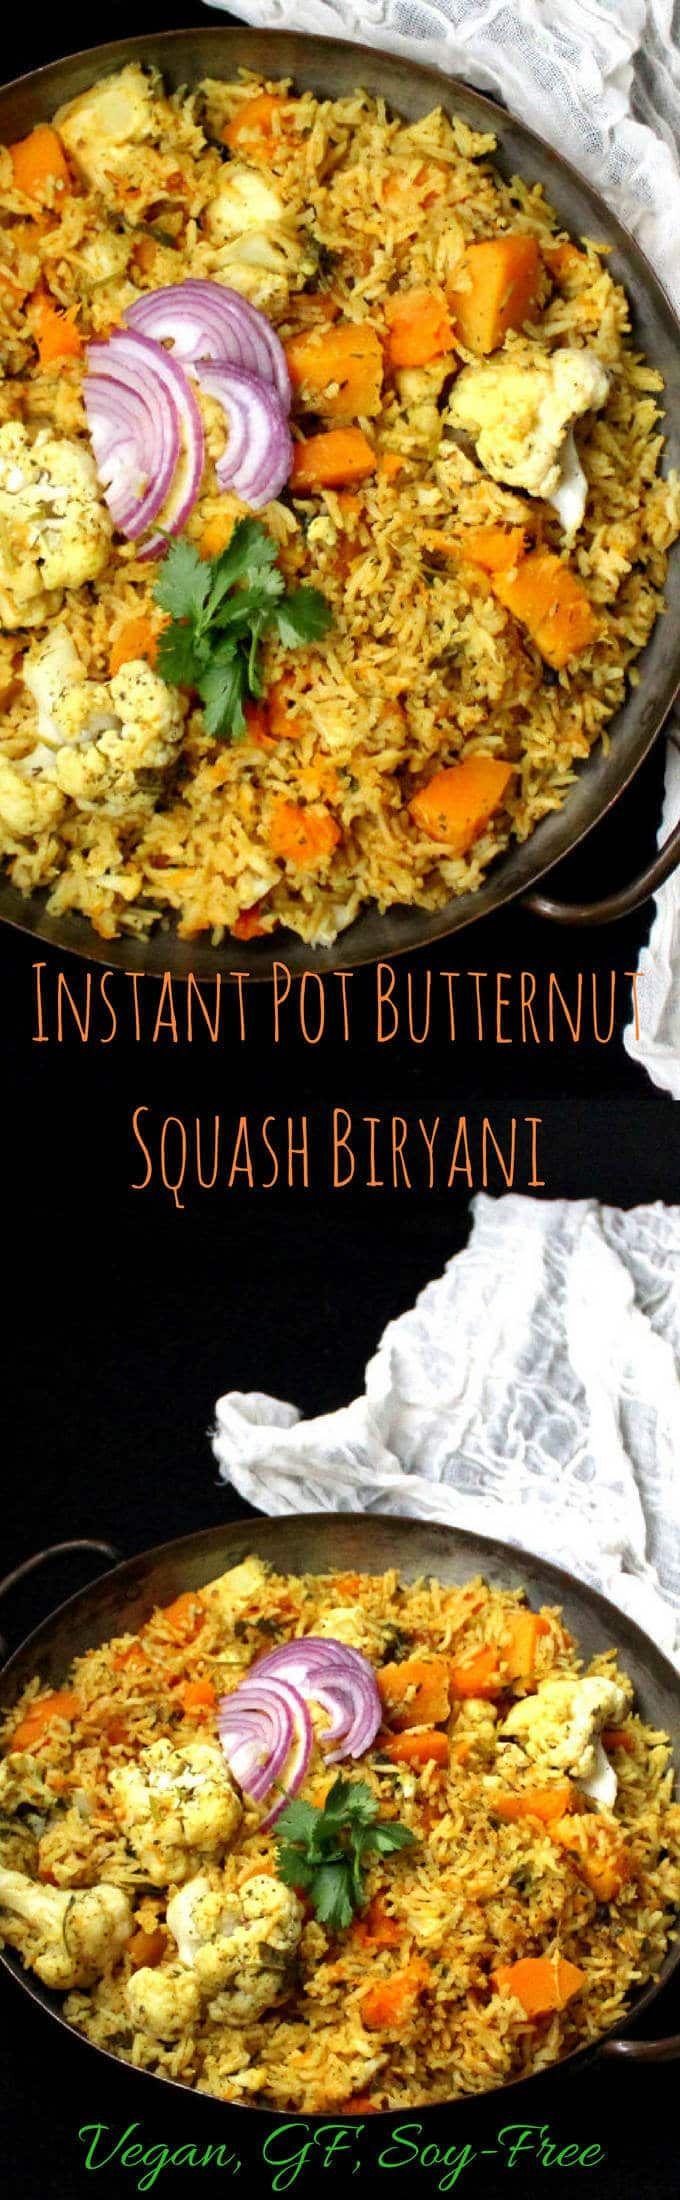 Butternut Squash Biryani In An Instant Pot